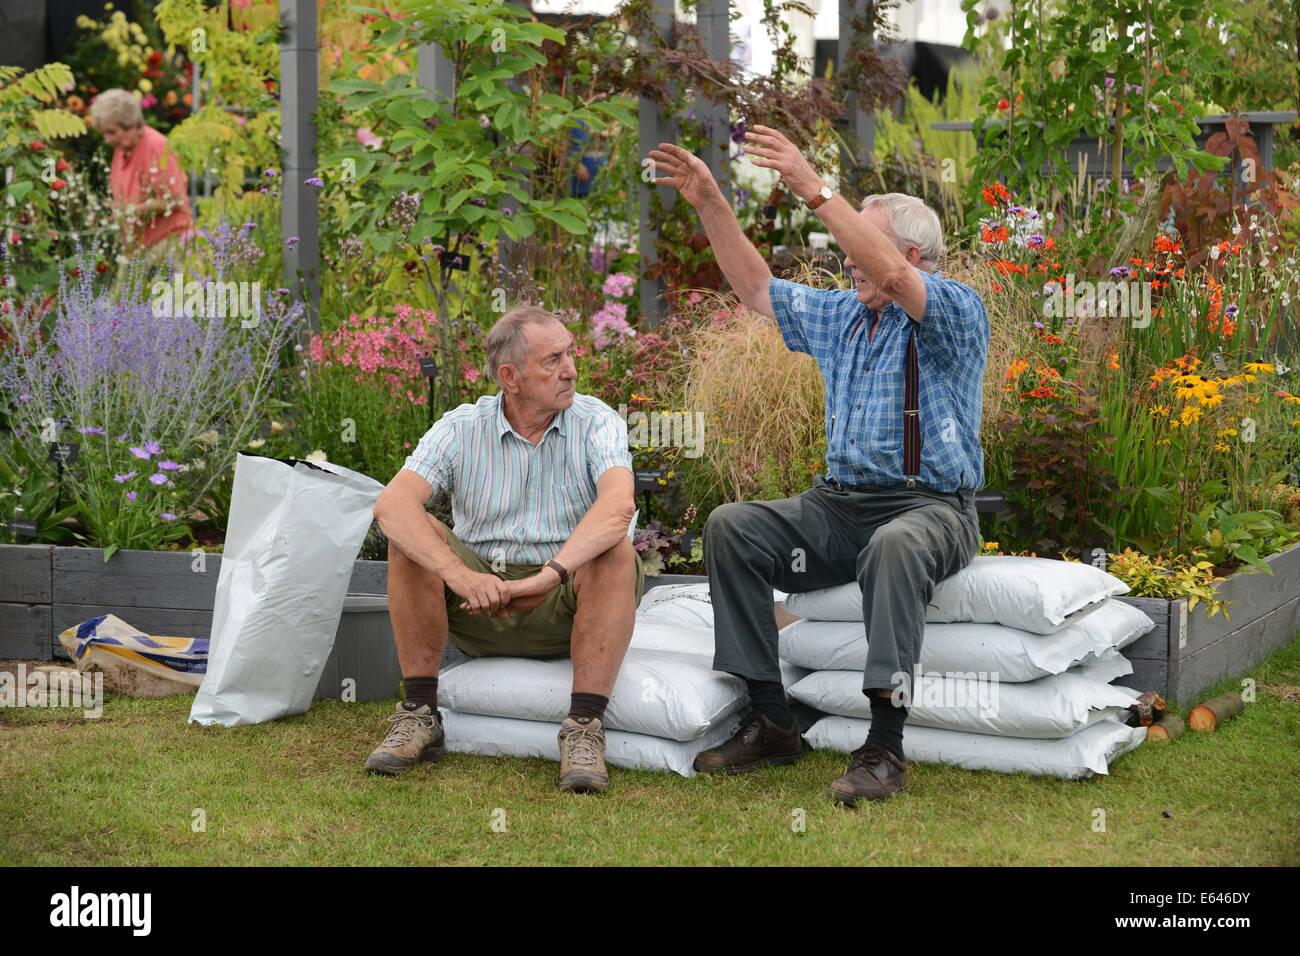 Gardeners exhibitors taking a break and talking at Shrewsbury Flower Show 2014 - Stock Image